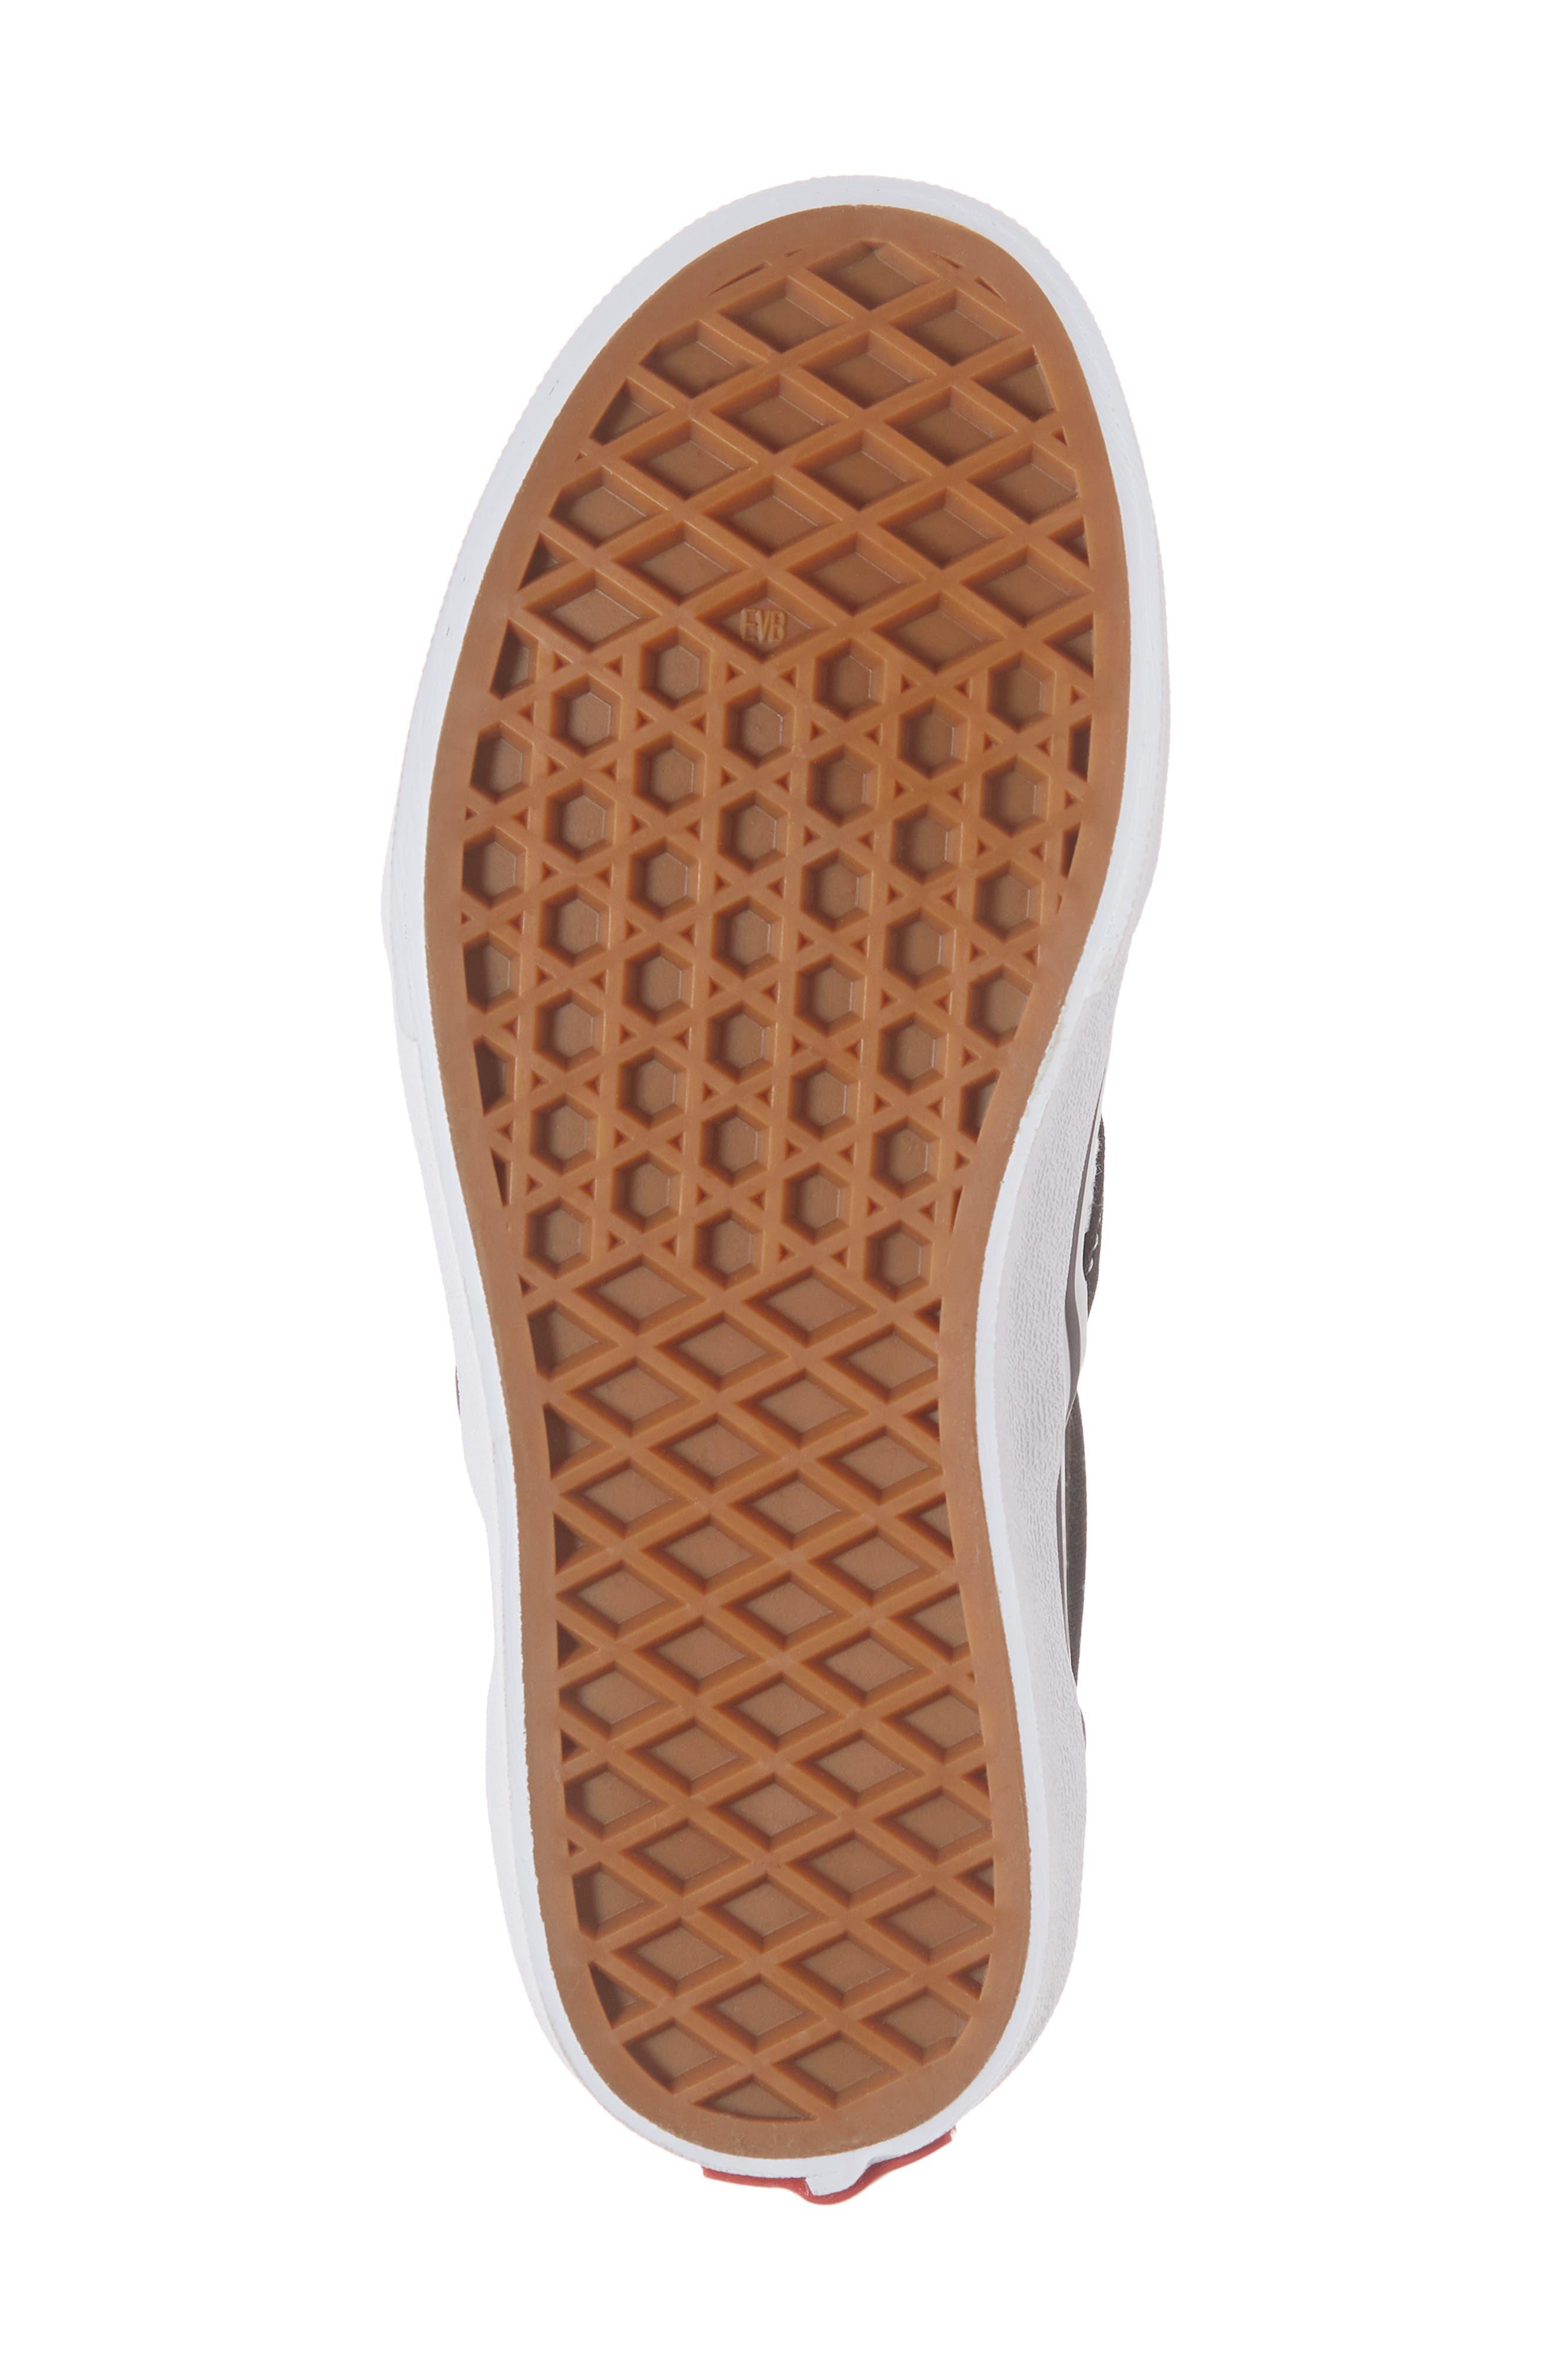 x Marvel<sup>®</sup> Hulk Checkerboard Slip-On Sneaker,                             Alternate thumbnail 6, color,                             310